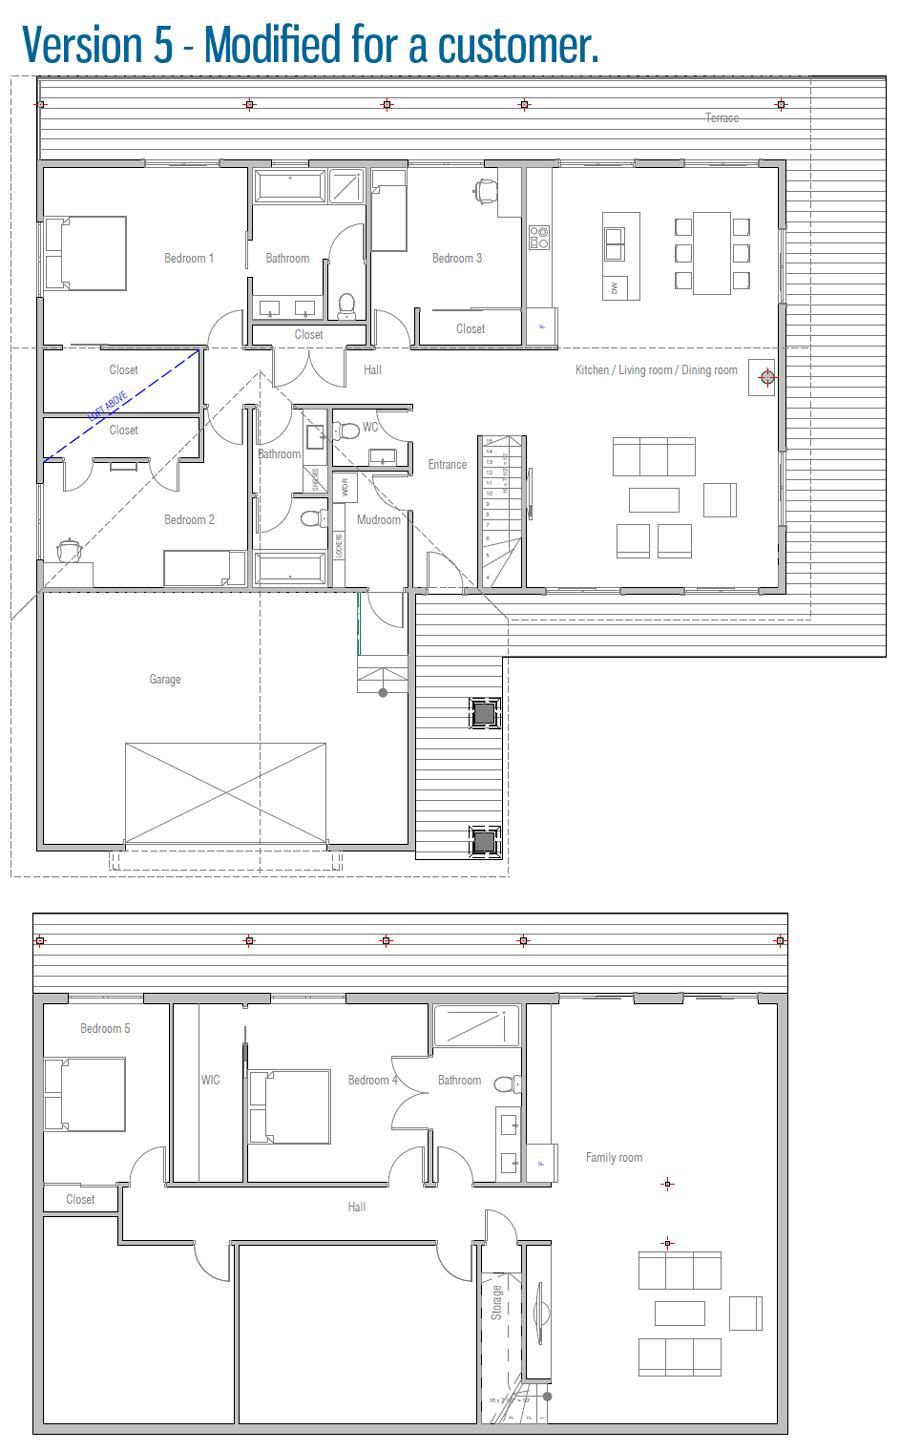 classical-designs_50_HOUSE_PLAN_CH431_V5.jpg